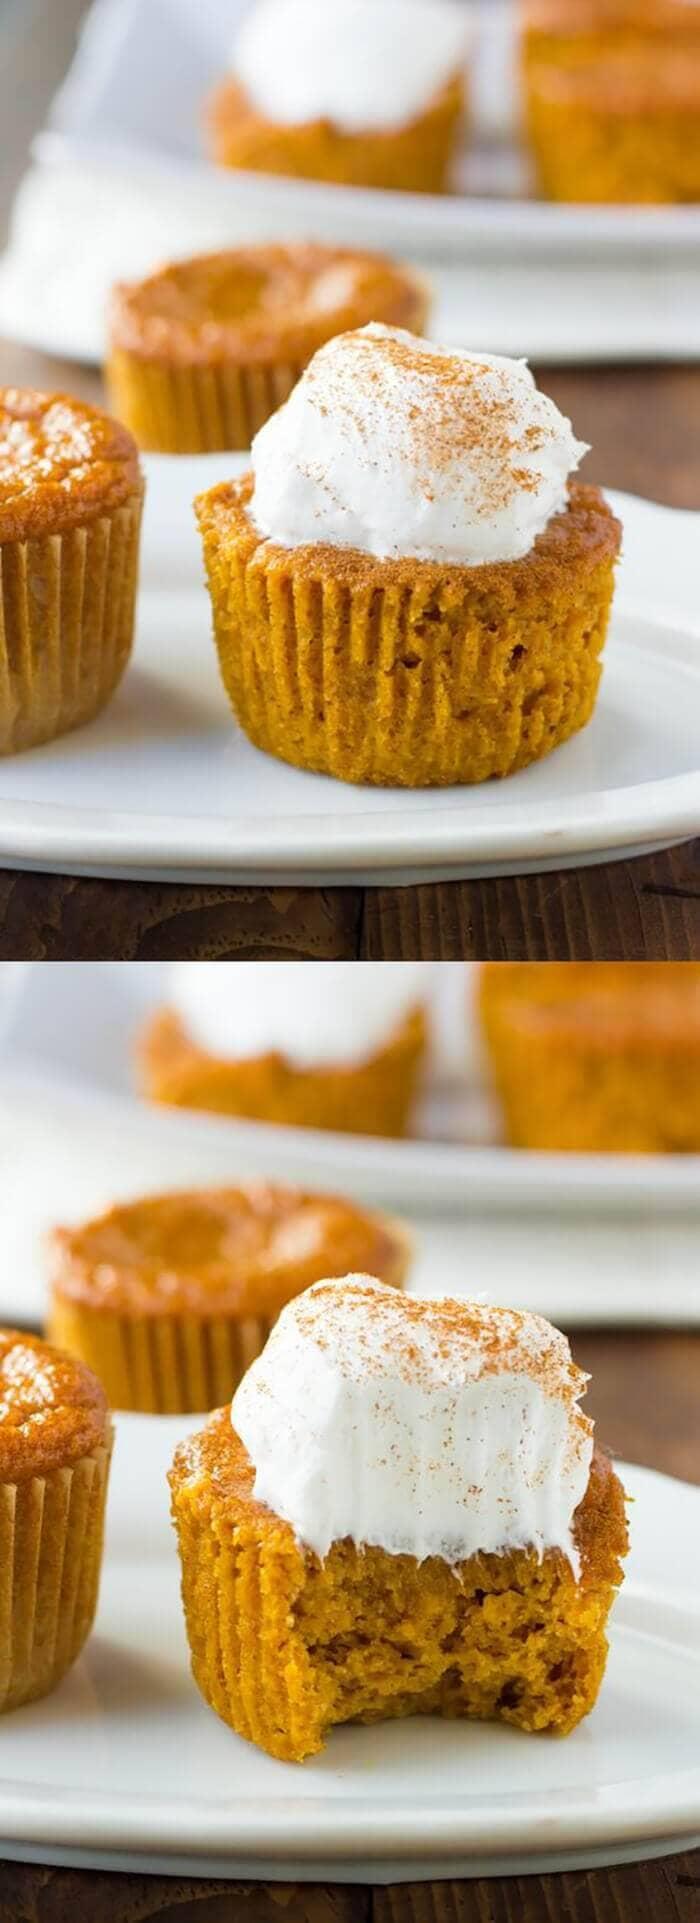 Gluten-free Crust less Pumpkin Pie Cupcakes